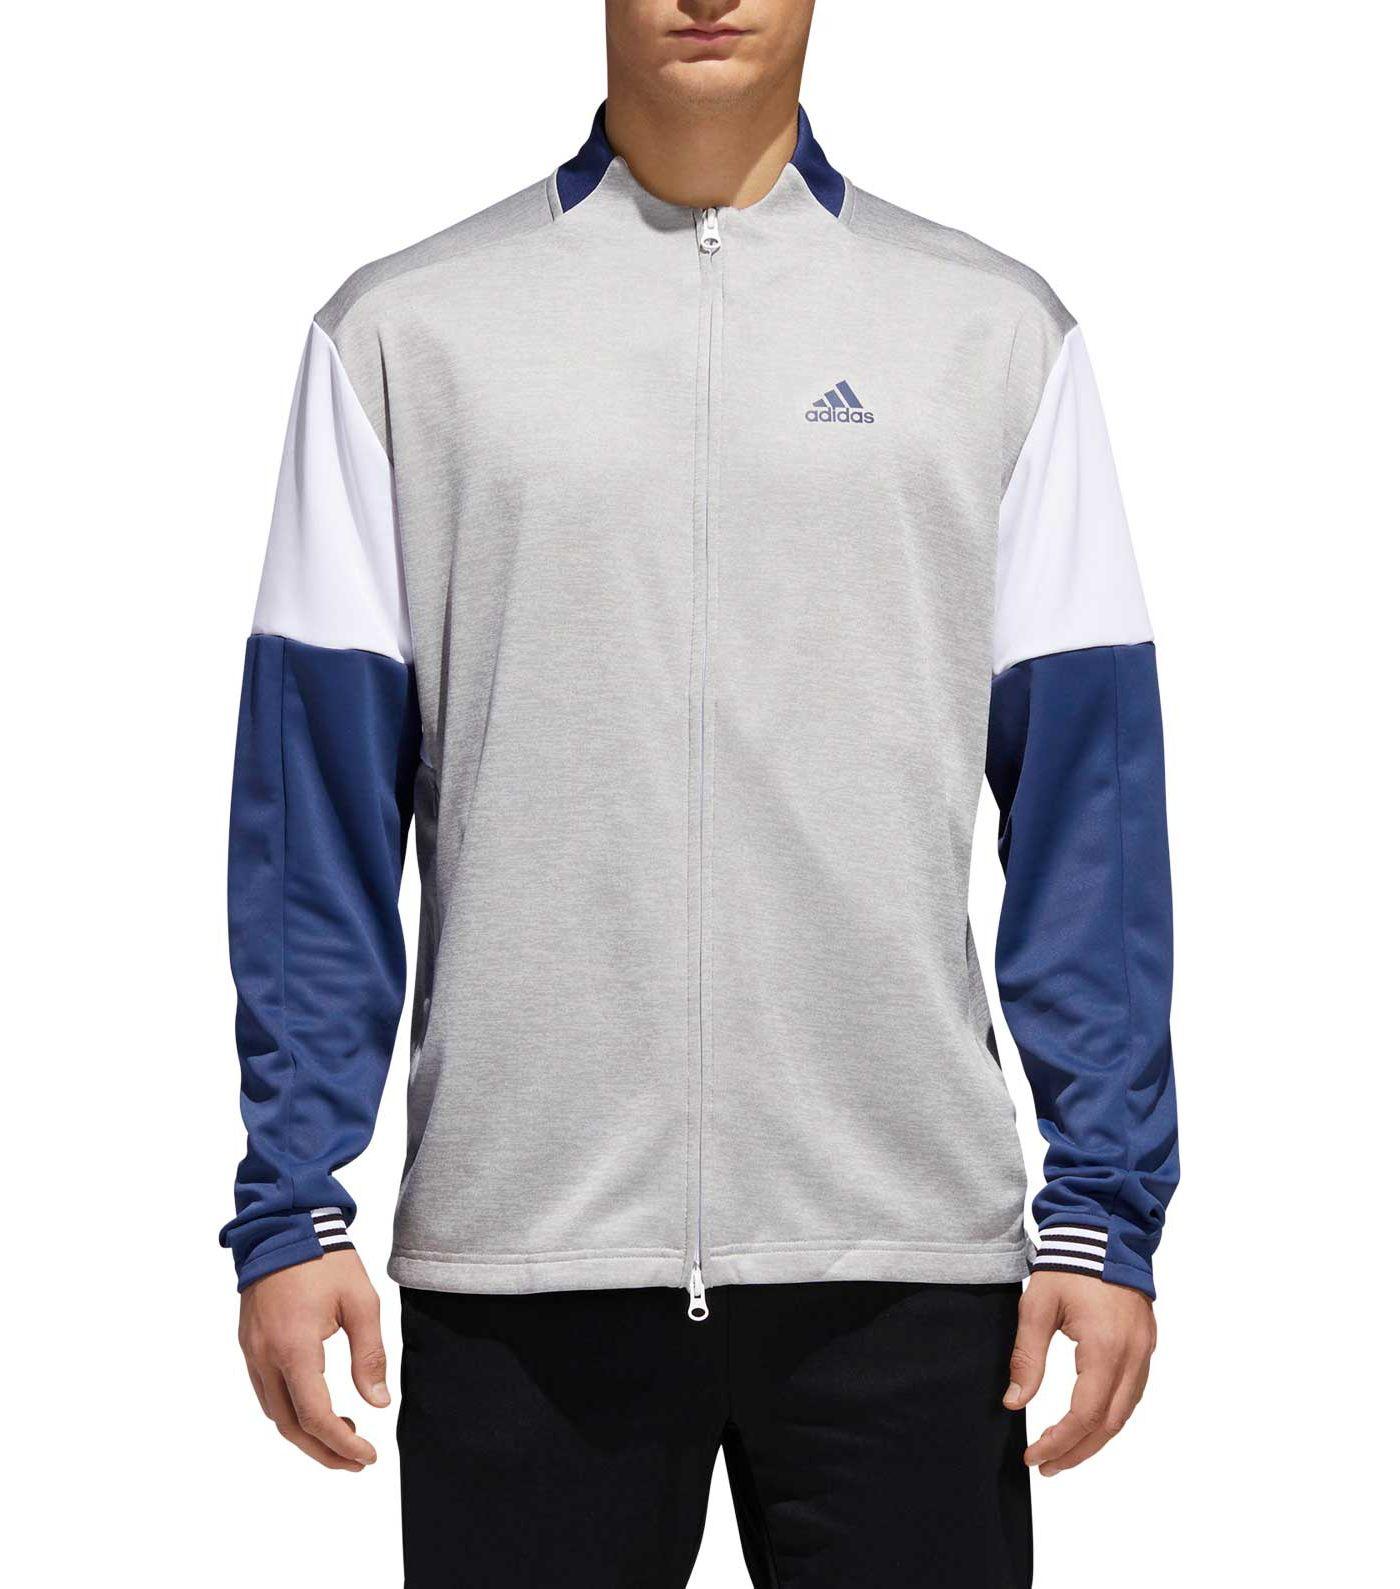 adidas Men's Team Issue Lite Bomber Jacket